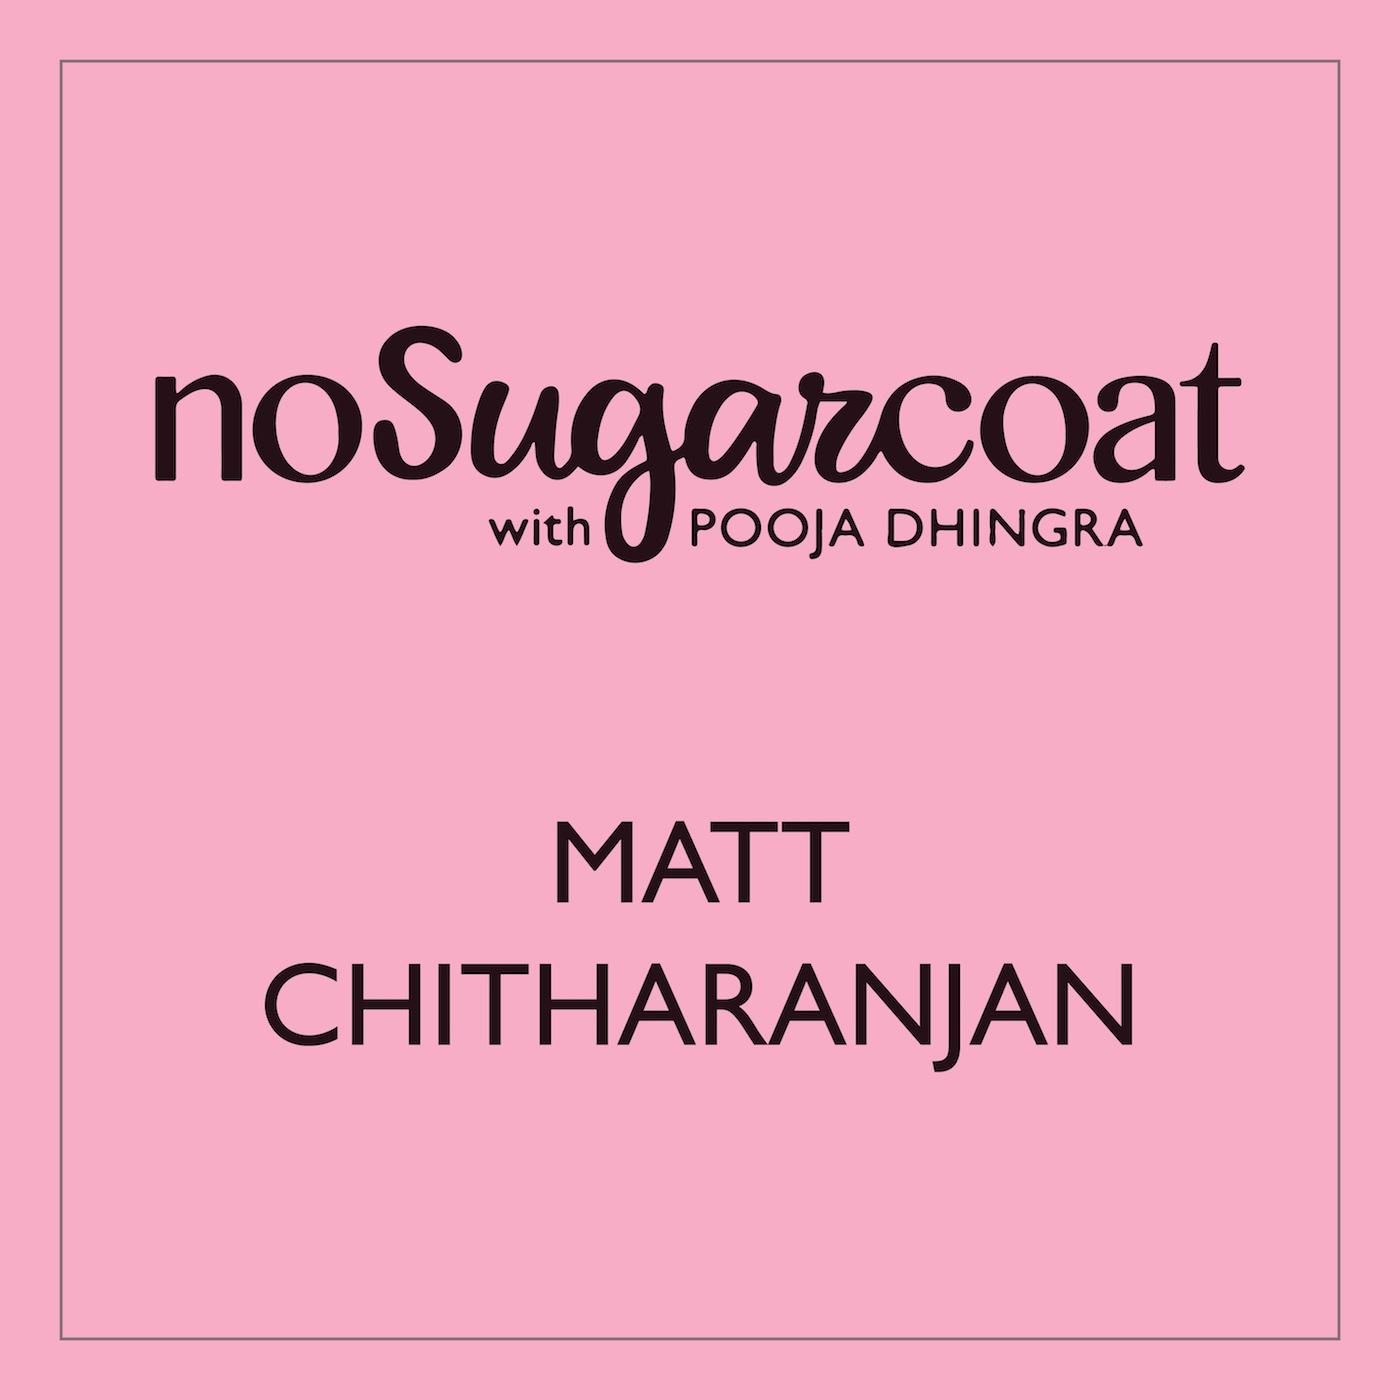 Matt Chitharanjan